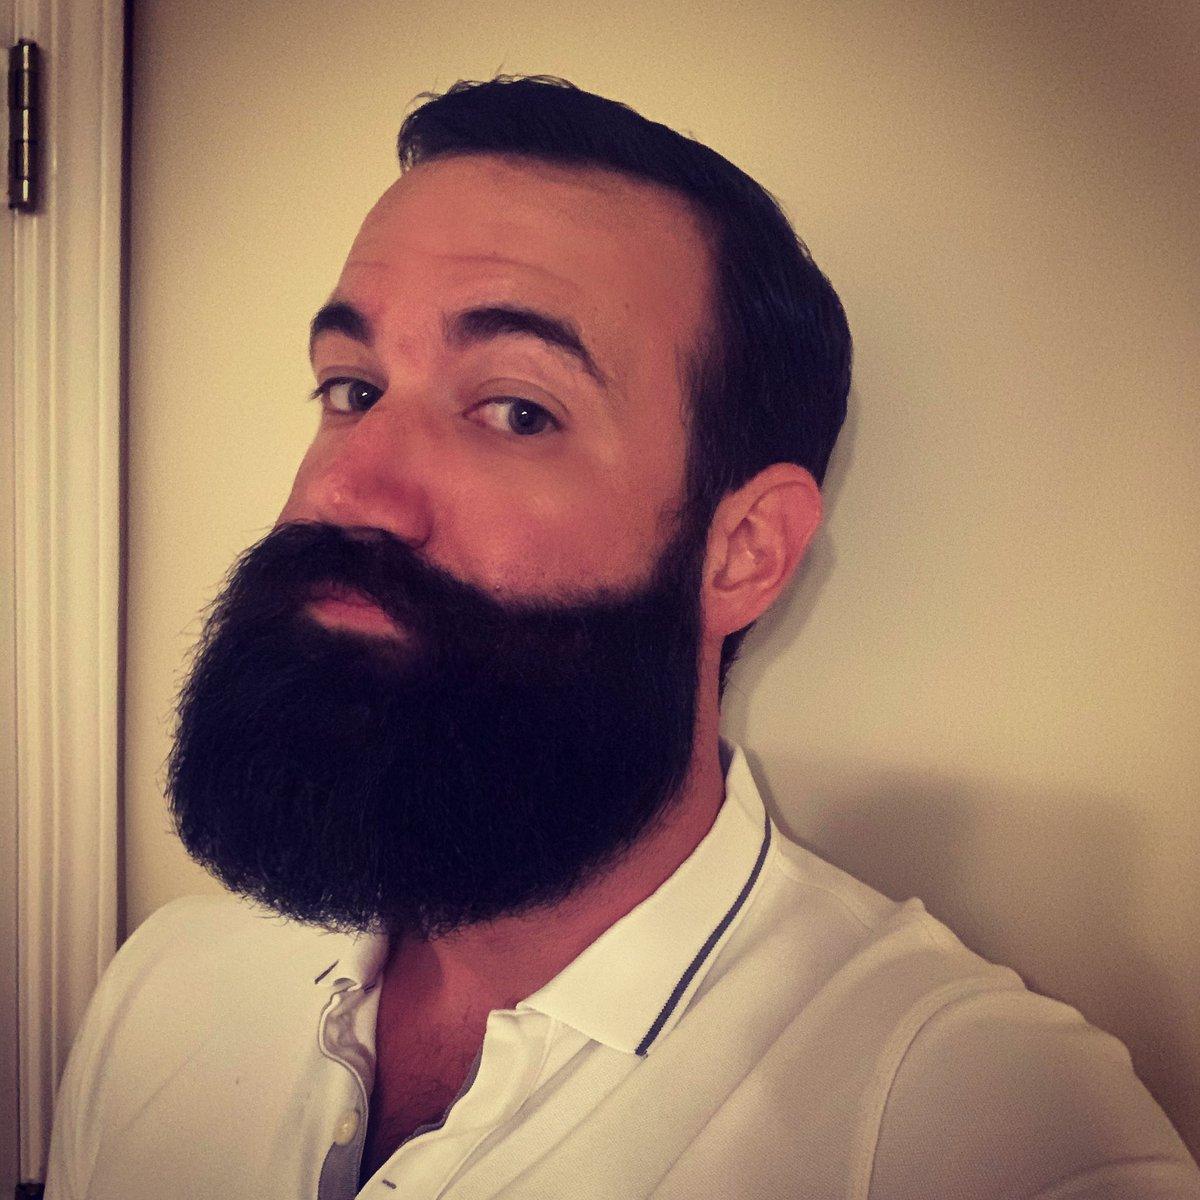 "My ""I don't want to go to work but at least I'm learning how to style my beard"" face #bearded #beardpic.twitter.com/h4M3HEt6Cc"